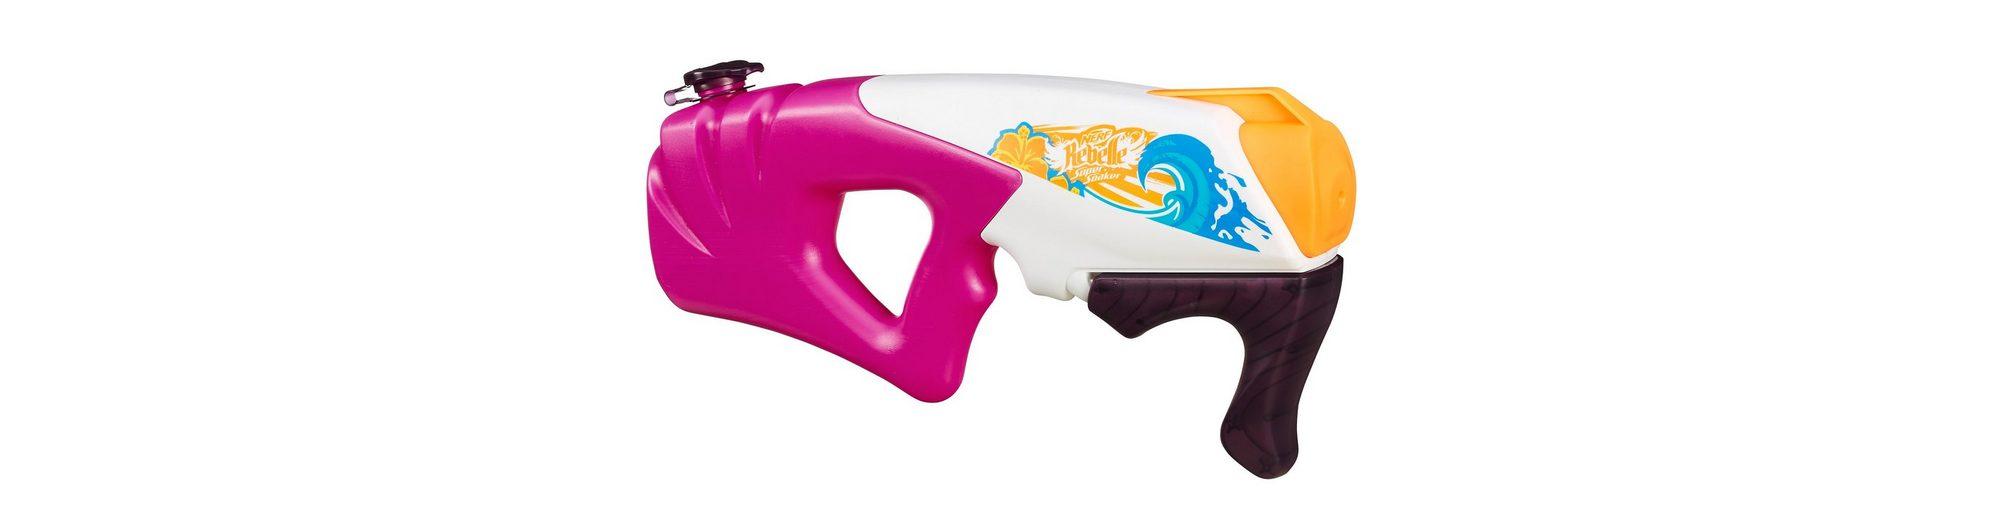 Hasbro Wasserspritzpistole, »Nerf Rebelle Super Soaker Infinity Rush«